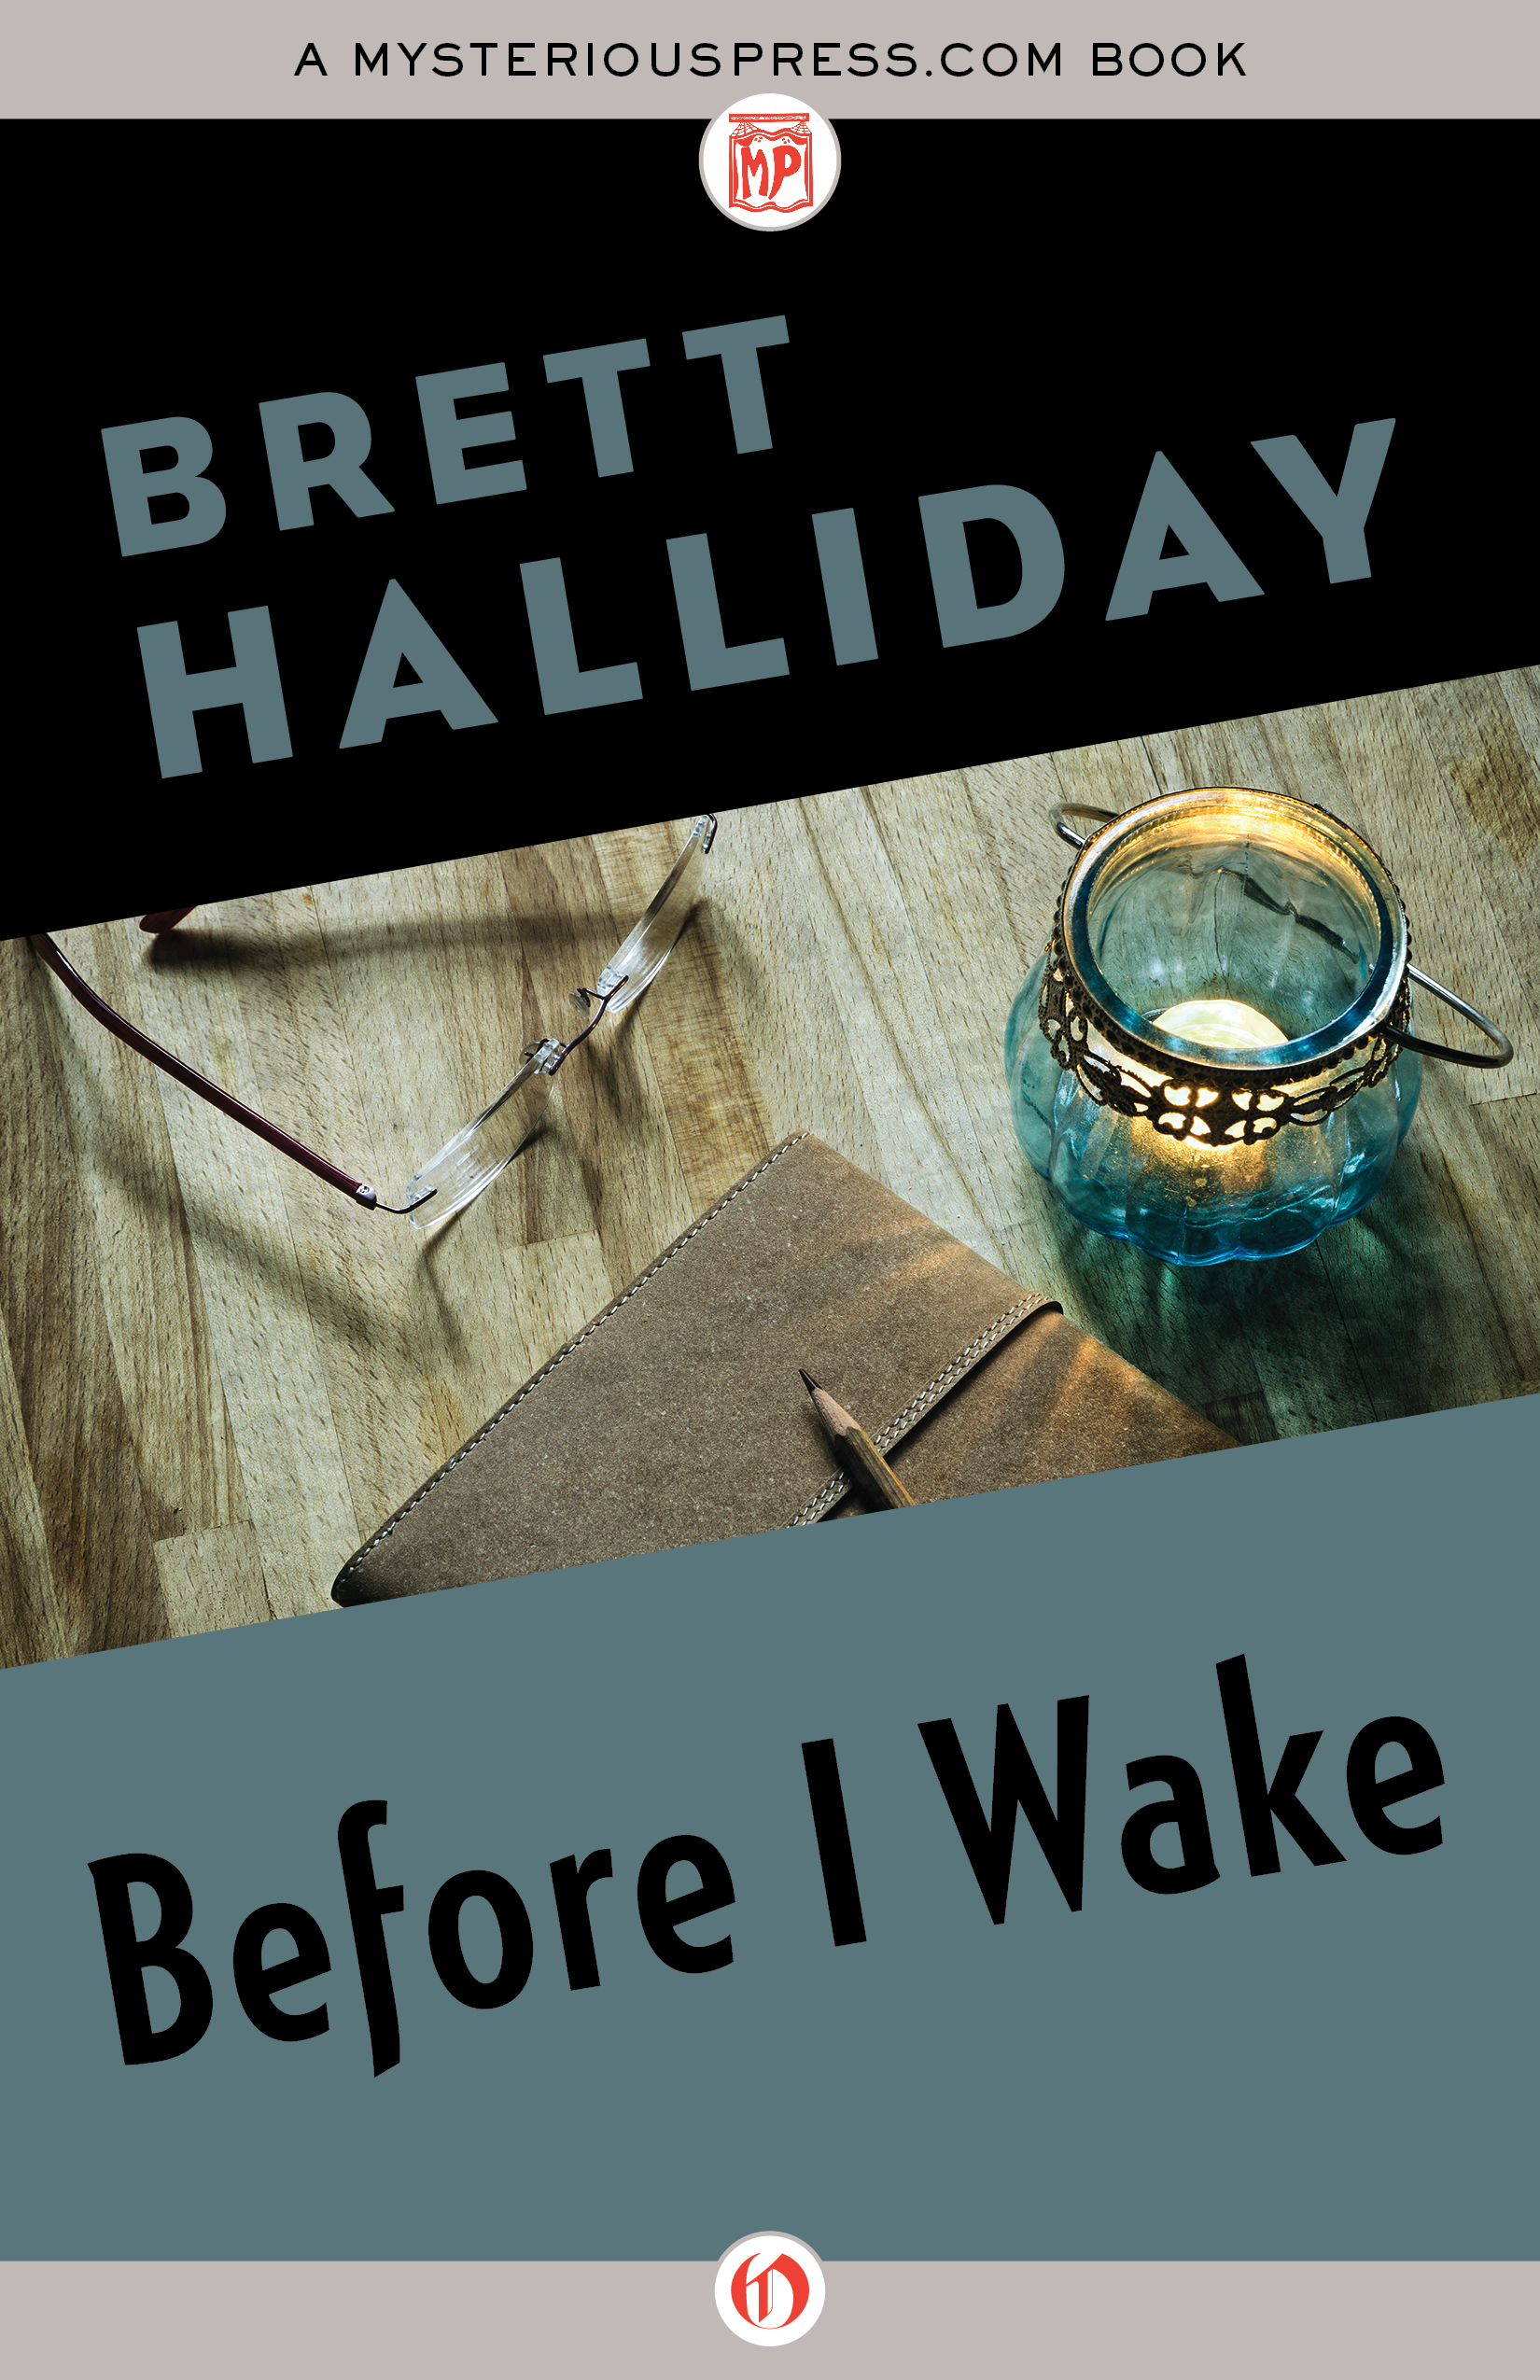 Before I Wake  by  Brett Halliday